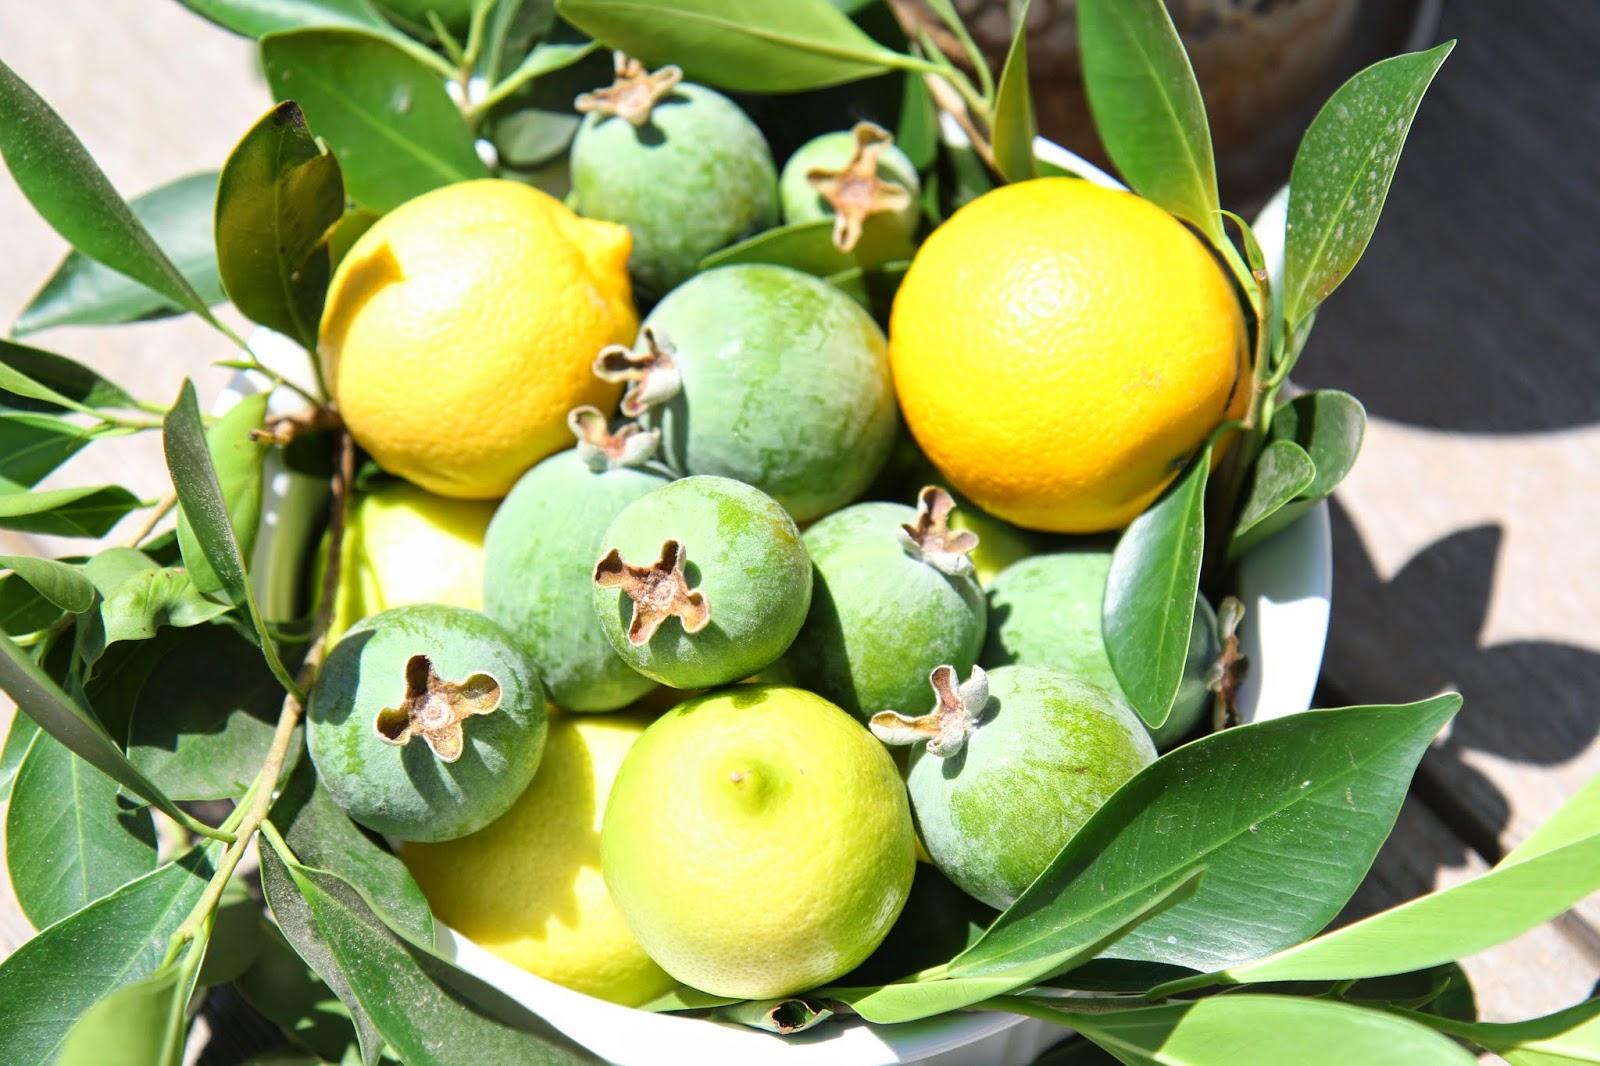 Lemons, Oranges, and Guavas: Simple Summer Fruit Bowl; Nora's Nest